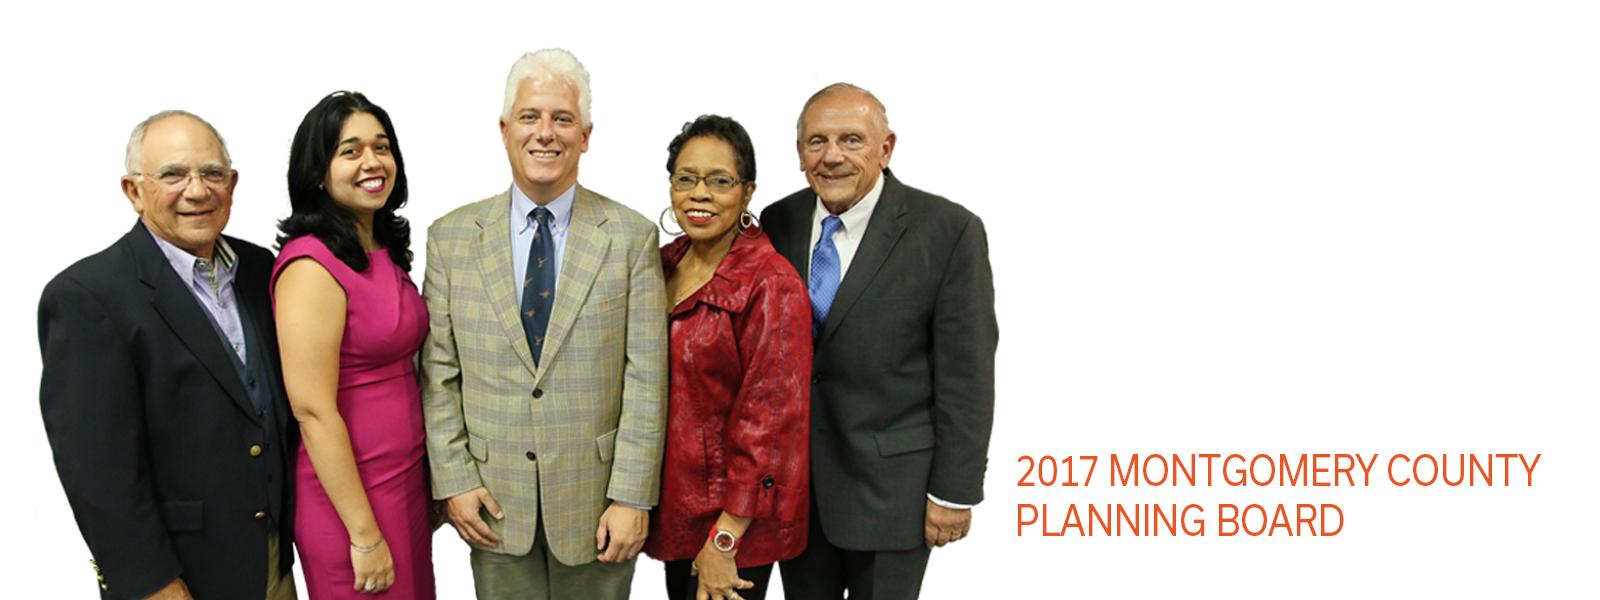 2017 Planning Board